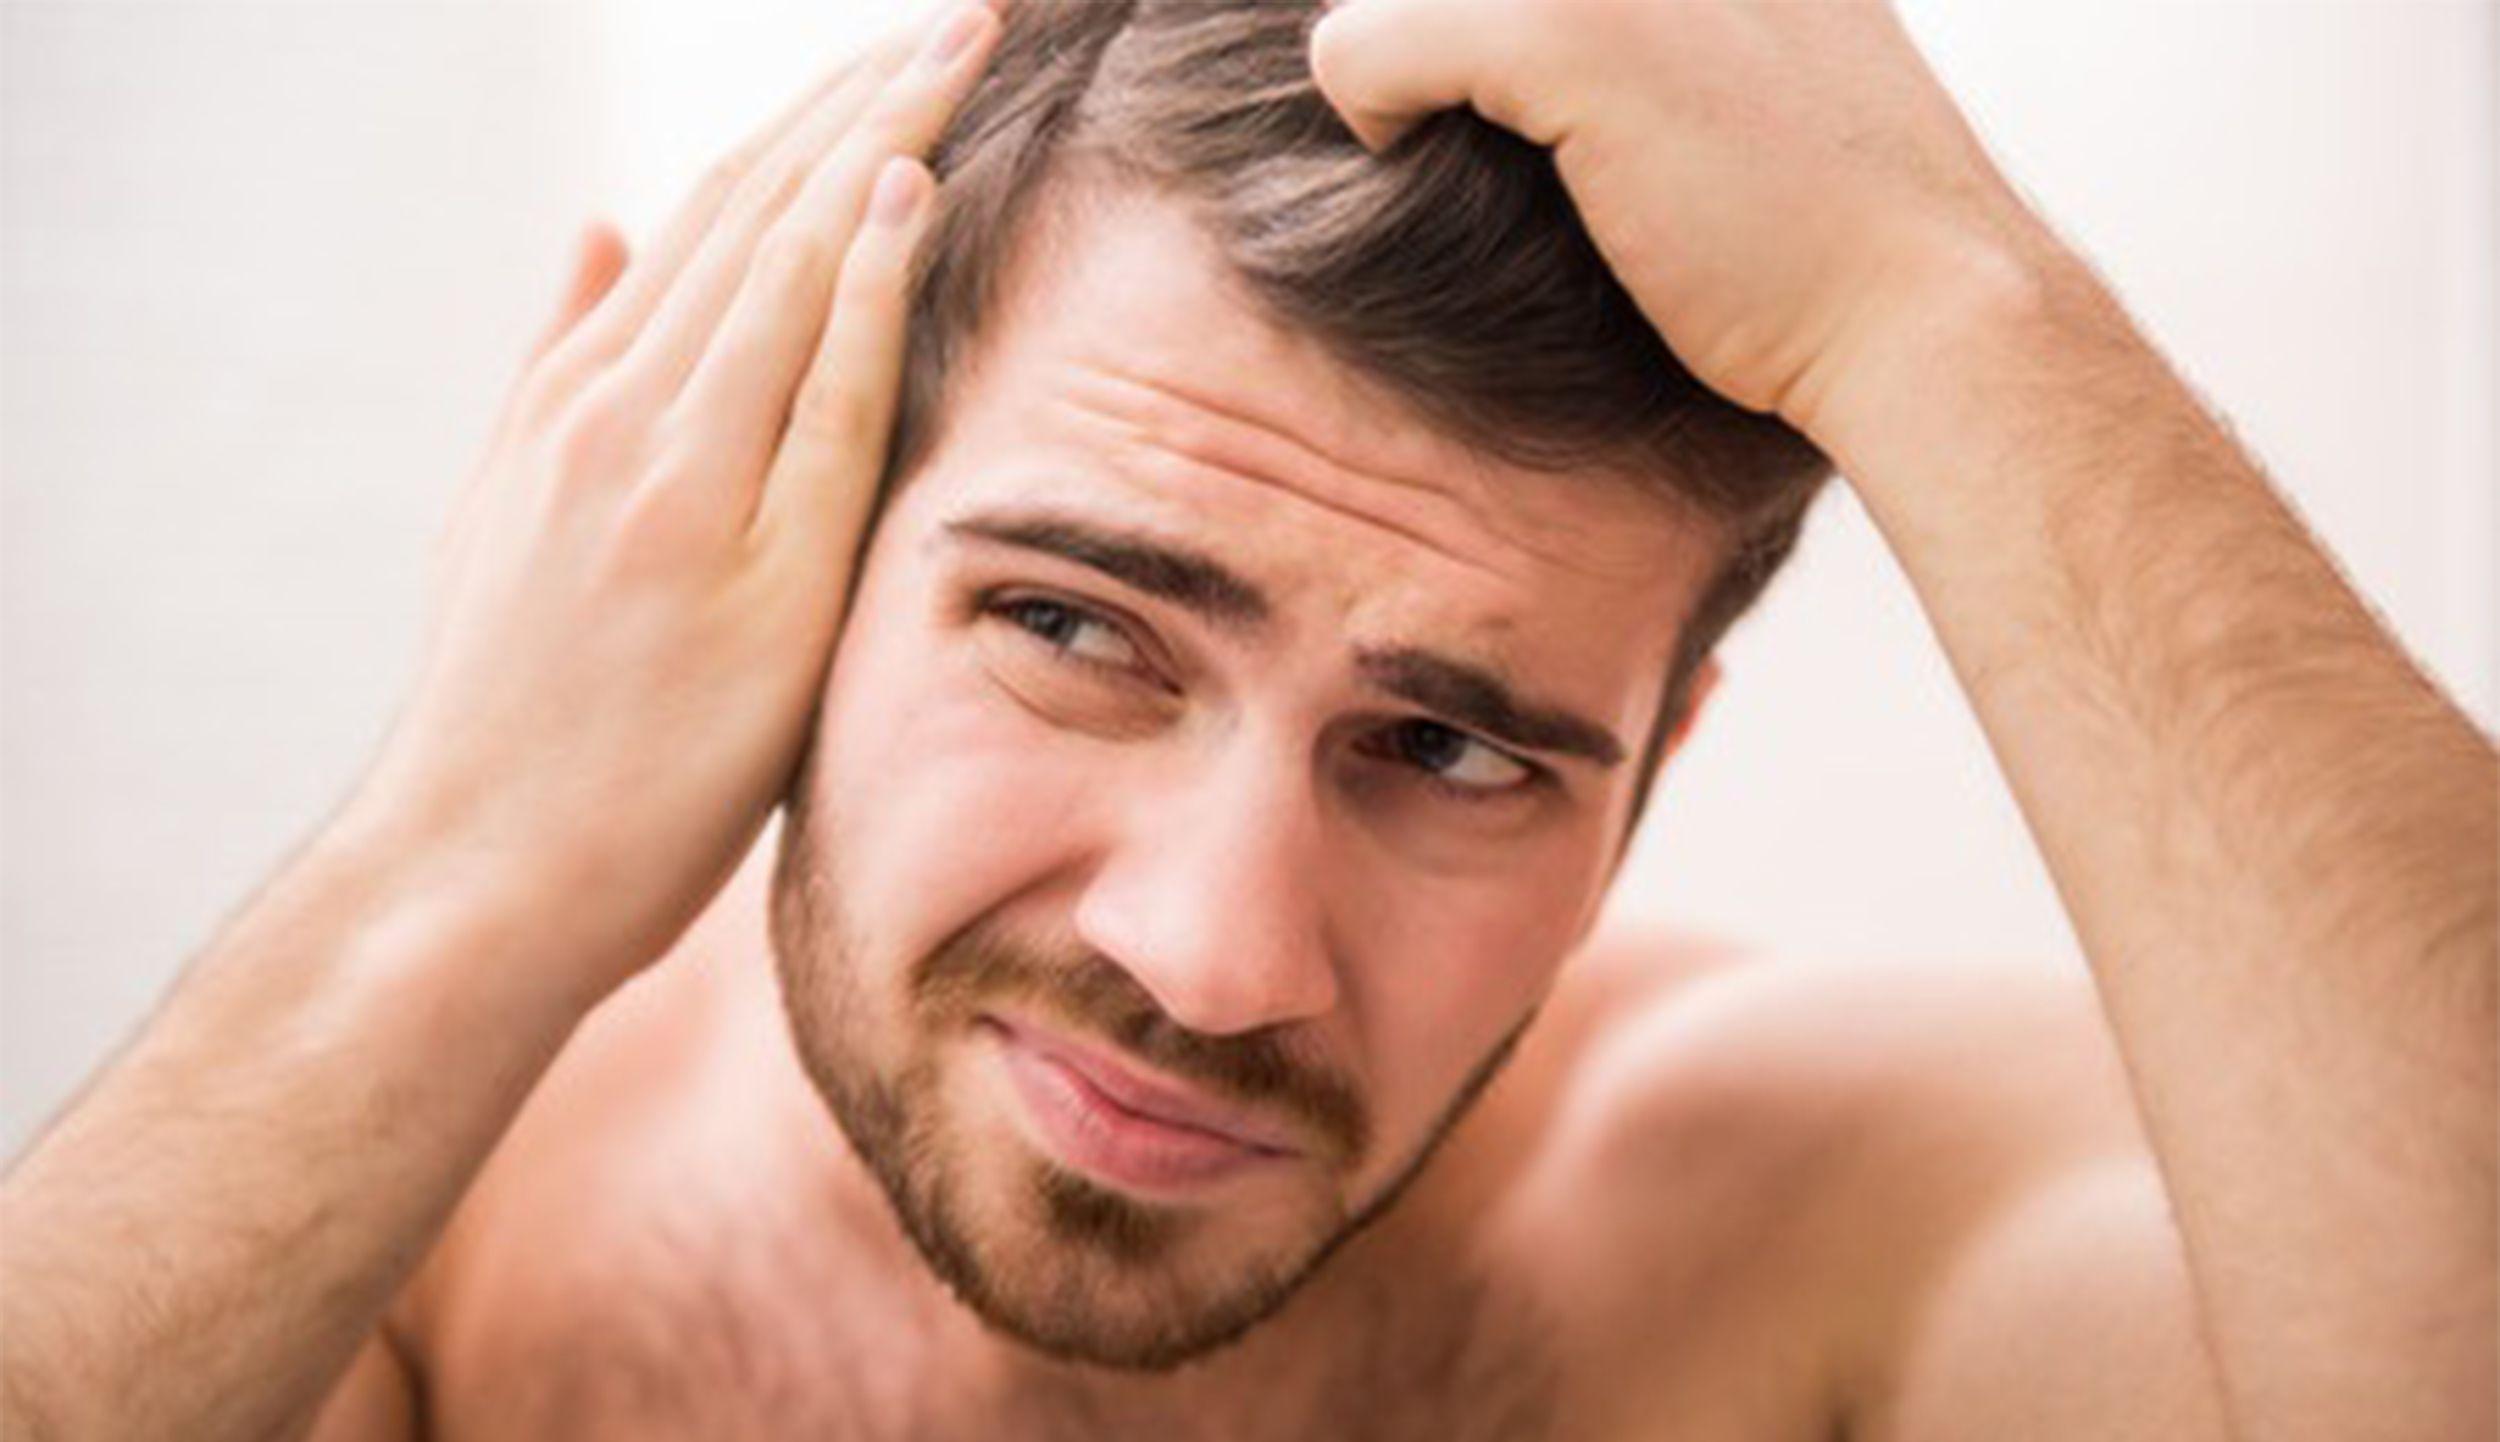 Rapid Hair Loss Causes In Men